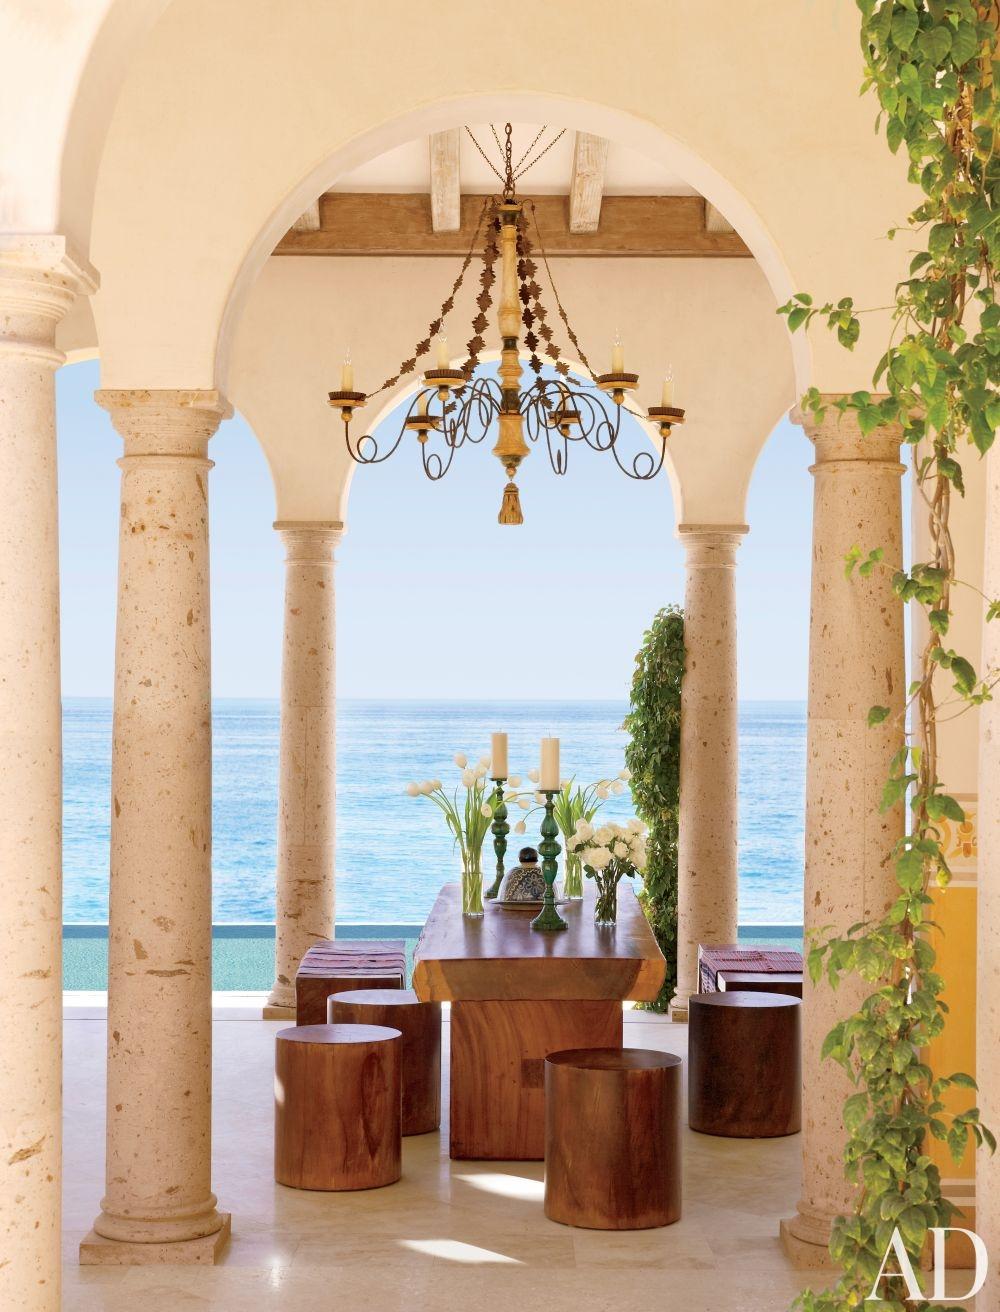 exotic-dining-room-marshall-watson-interiors-san-jos-del-cabo-mexico-201305_1000-watermarked